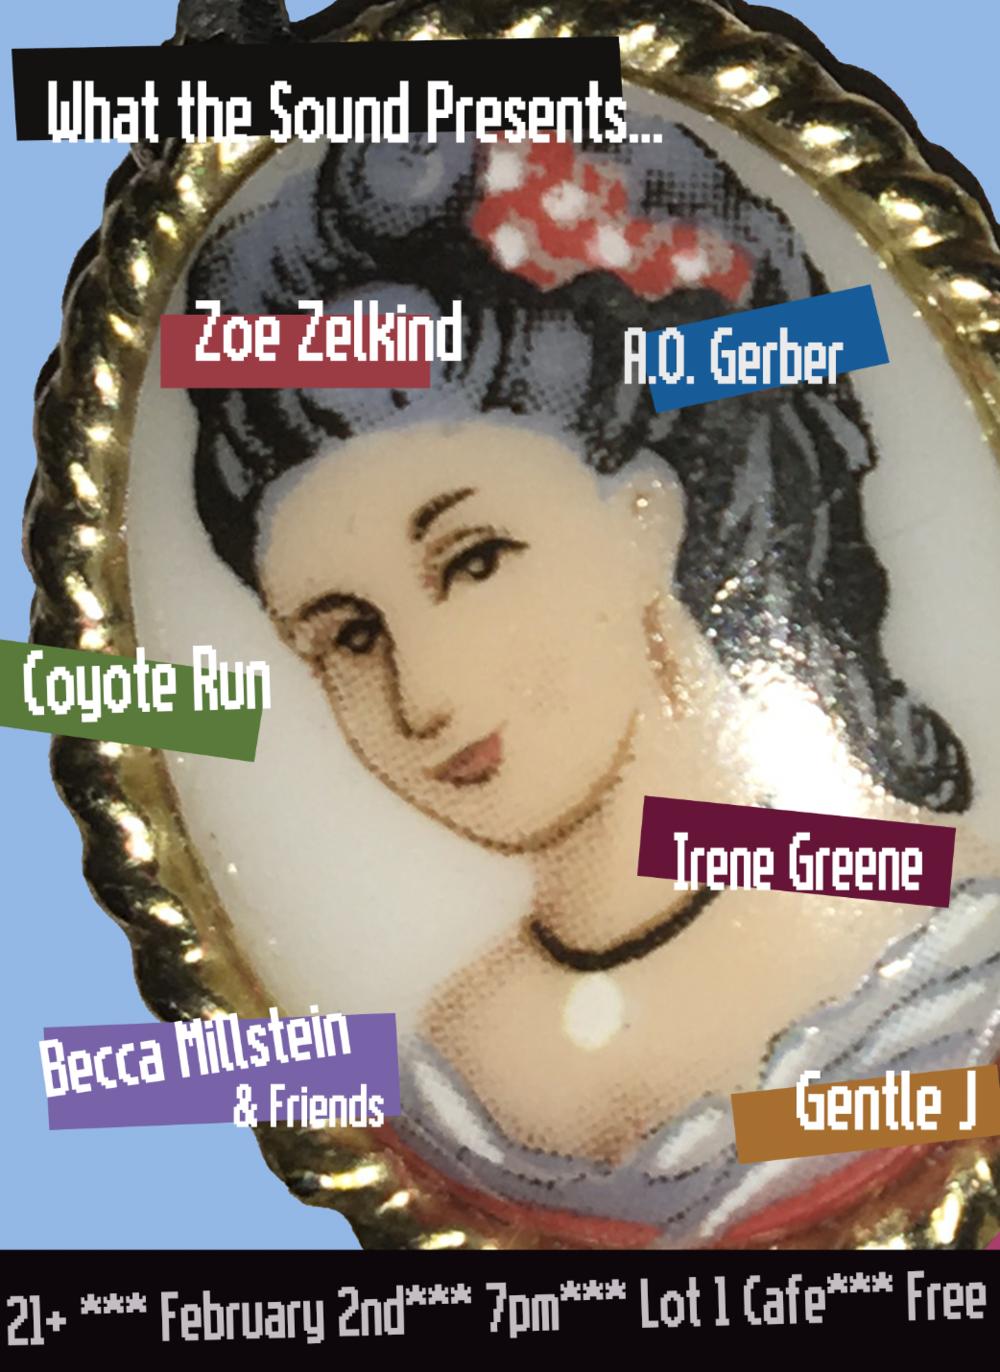 IRENE GREENE / COYOTE RUN / BECCA MILLSTEIN / GENTLE J / ZOE ZELKIND / A.O. GERBER - February 2 @ Lot 1 Cafe